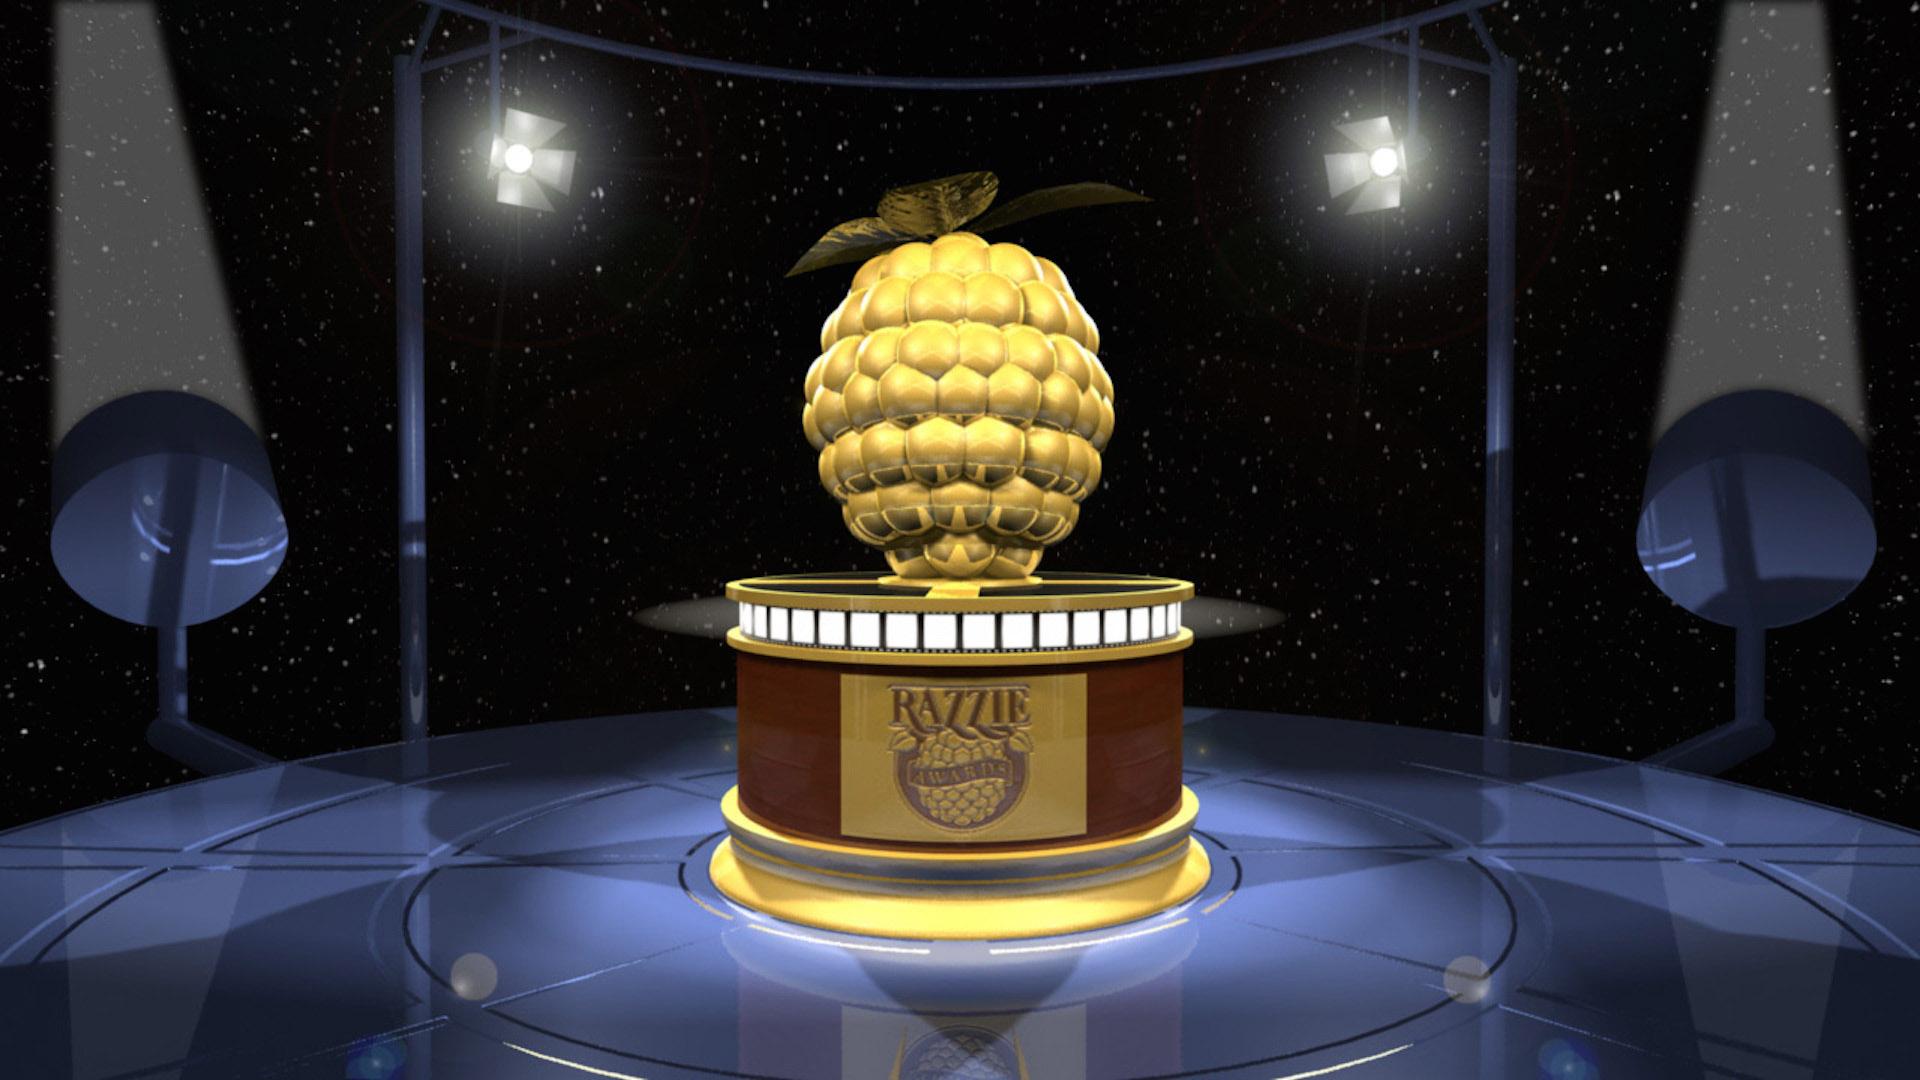 The-Razzie-Awards_2015_Courtesy-of-the-Razzies